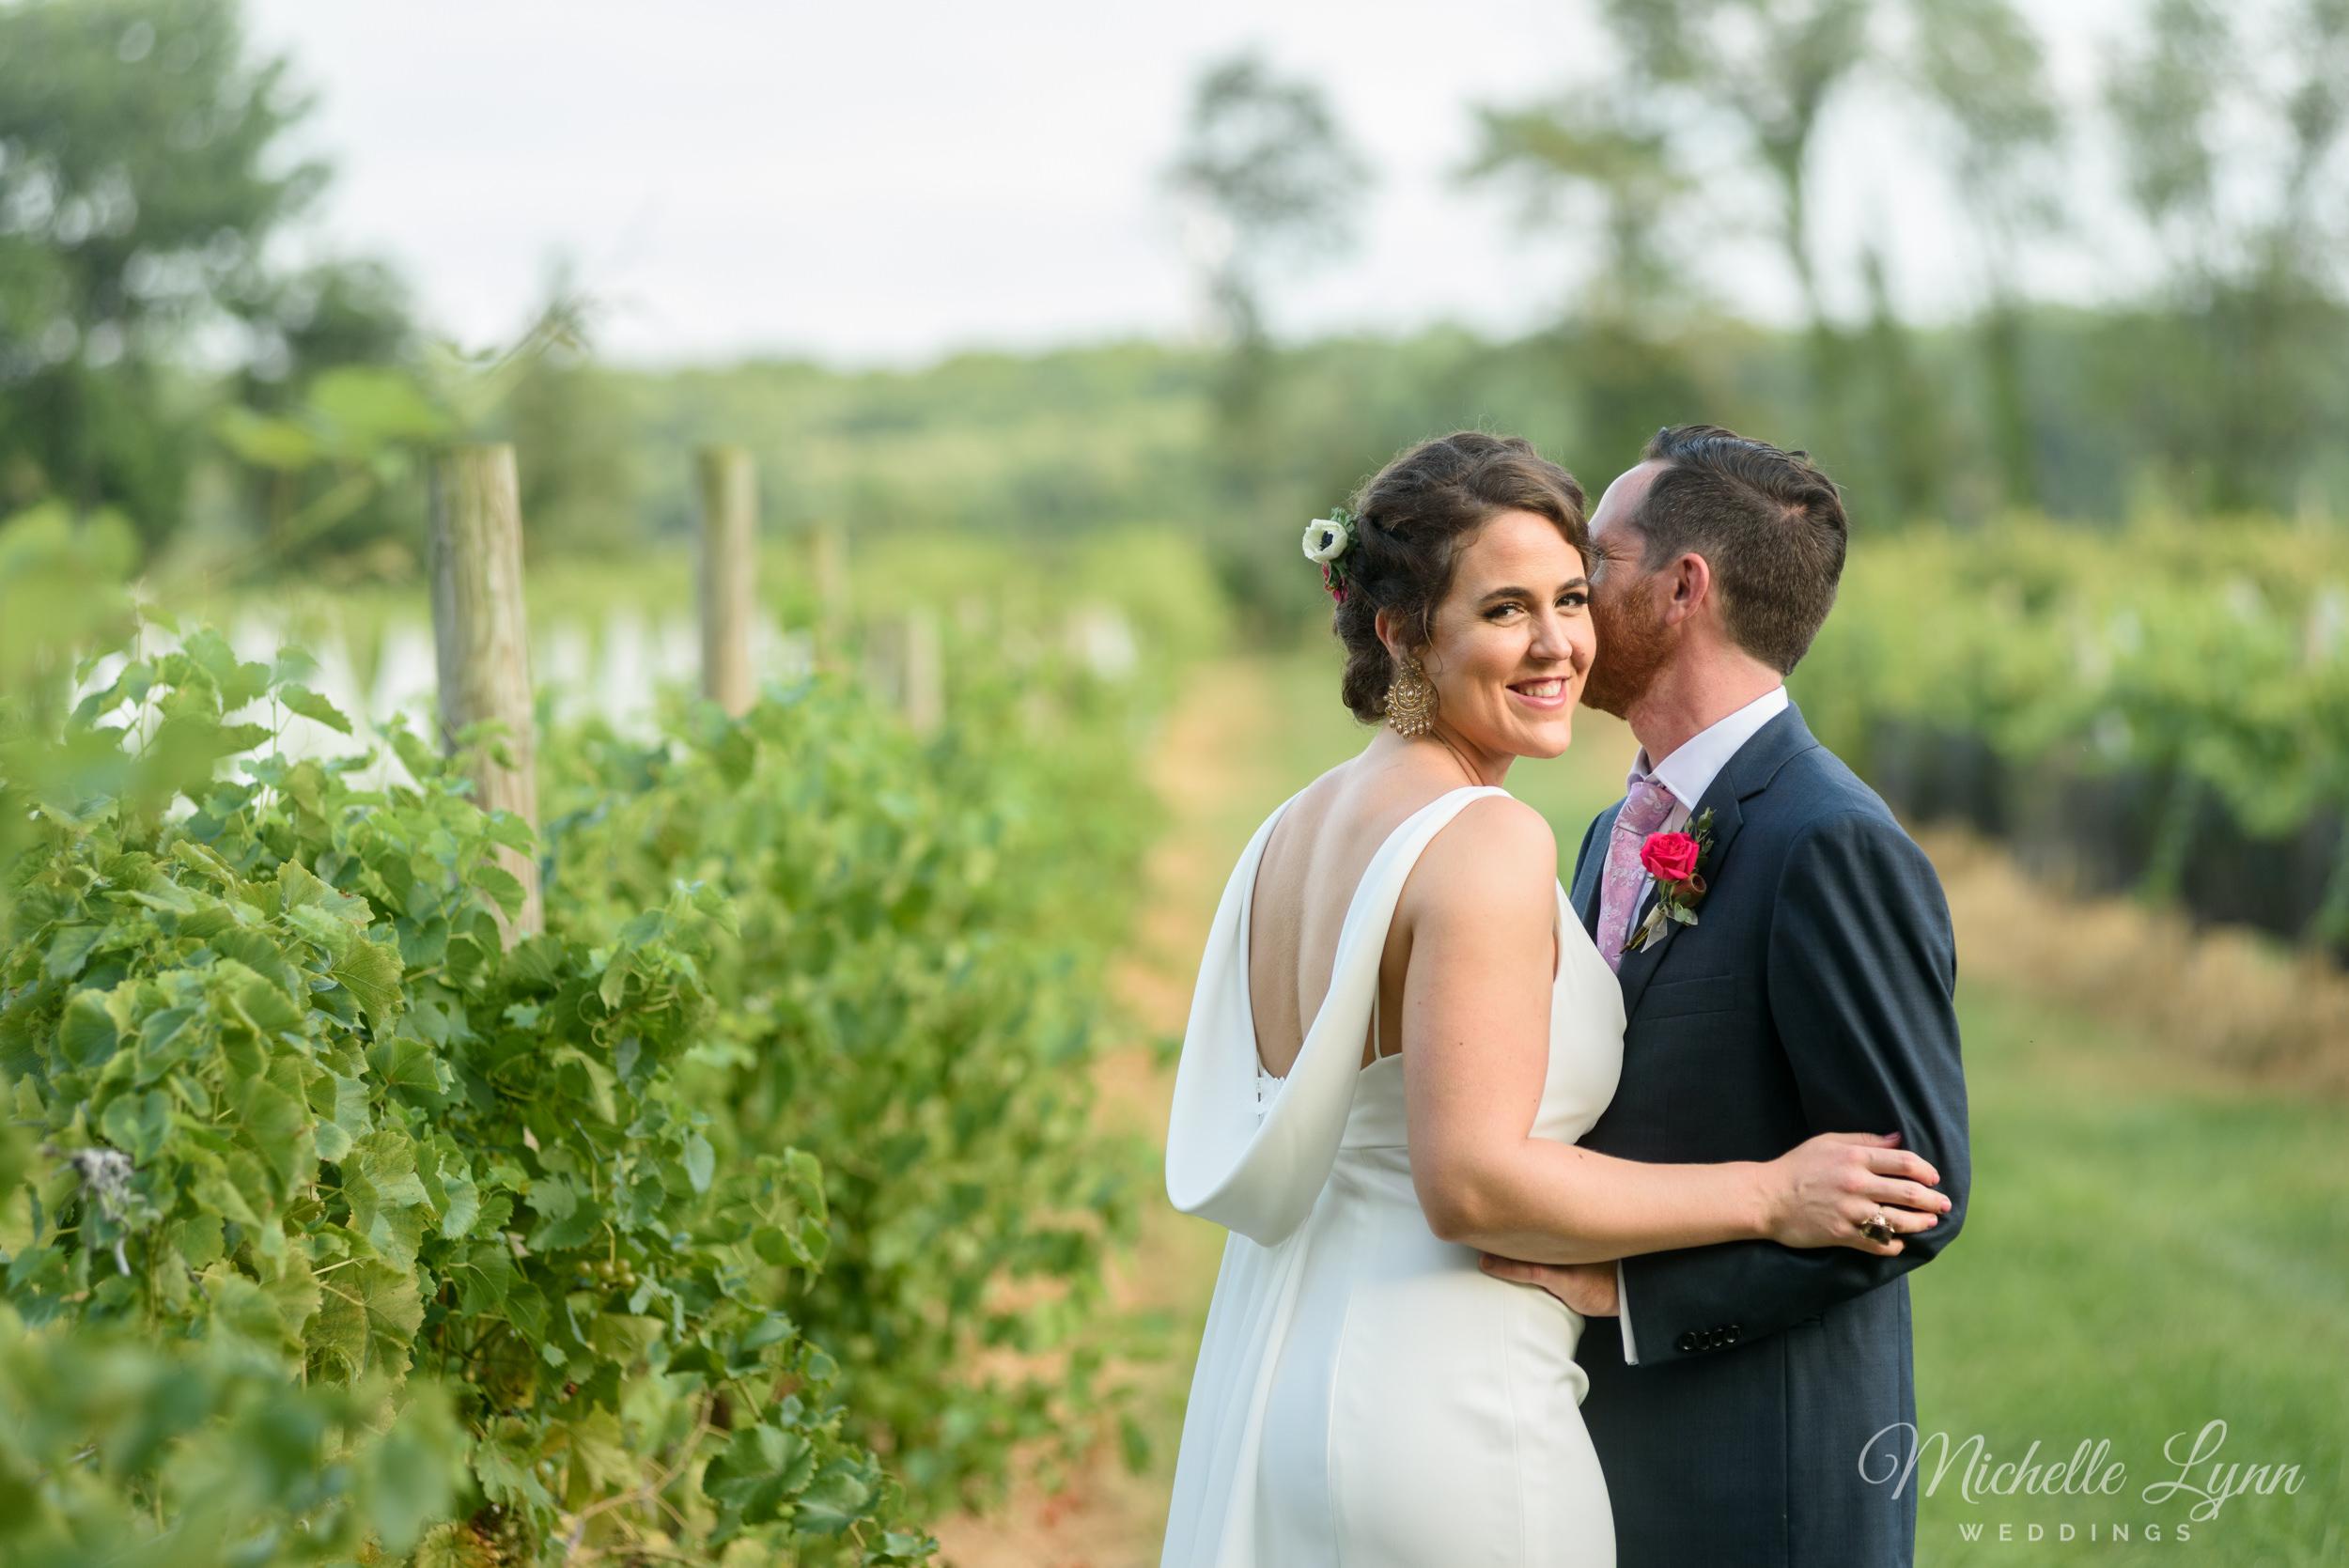 mlw-unionville-vineyards-nj-wedding-photography-63.jpg